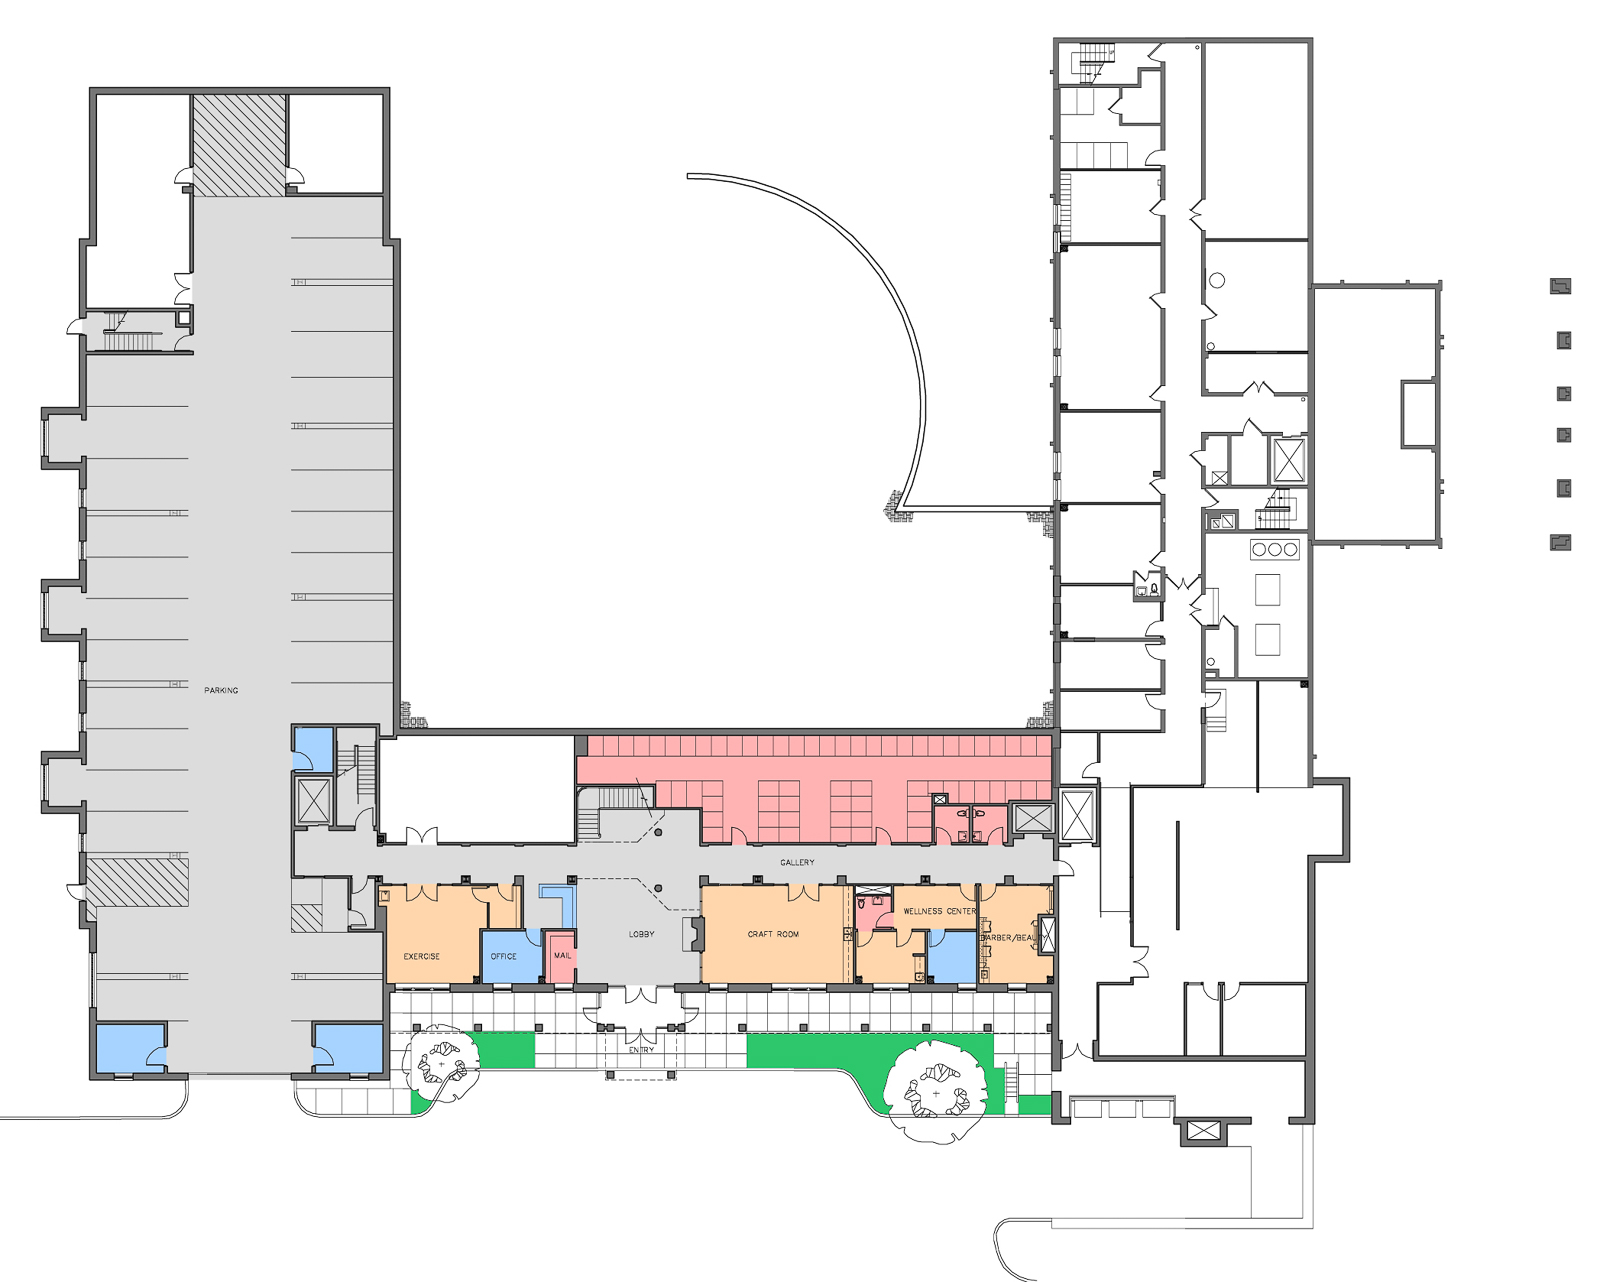 00040 Shenango Ground Floor Rendered